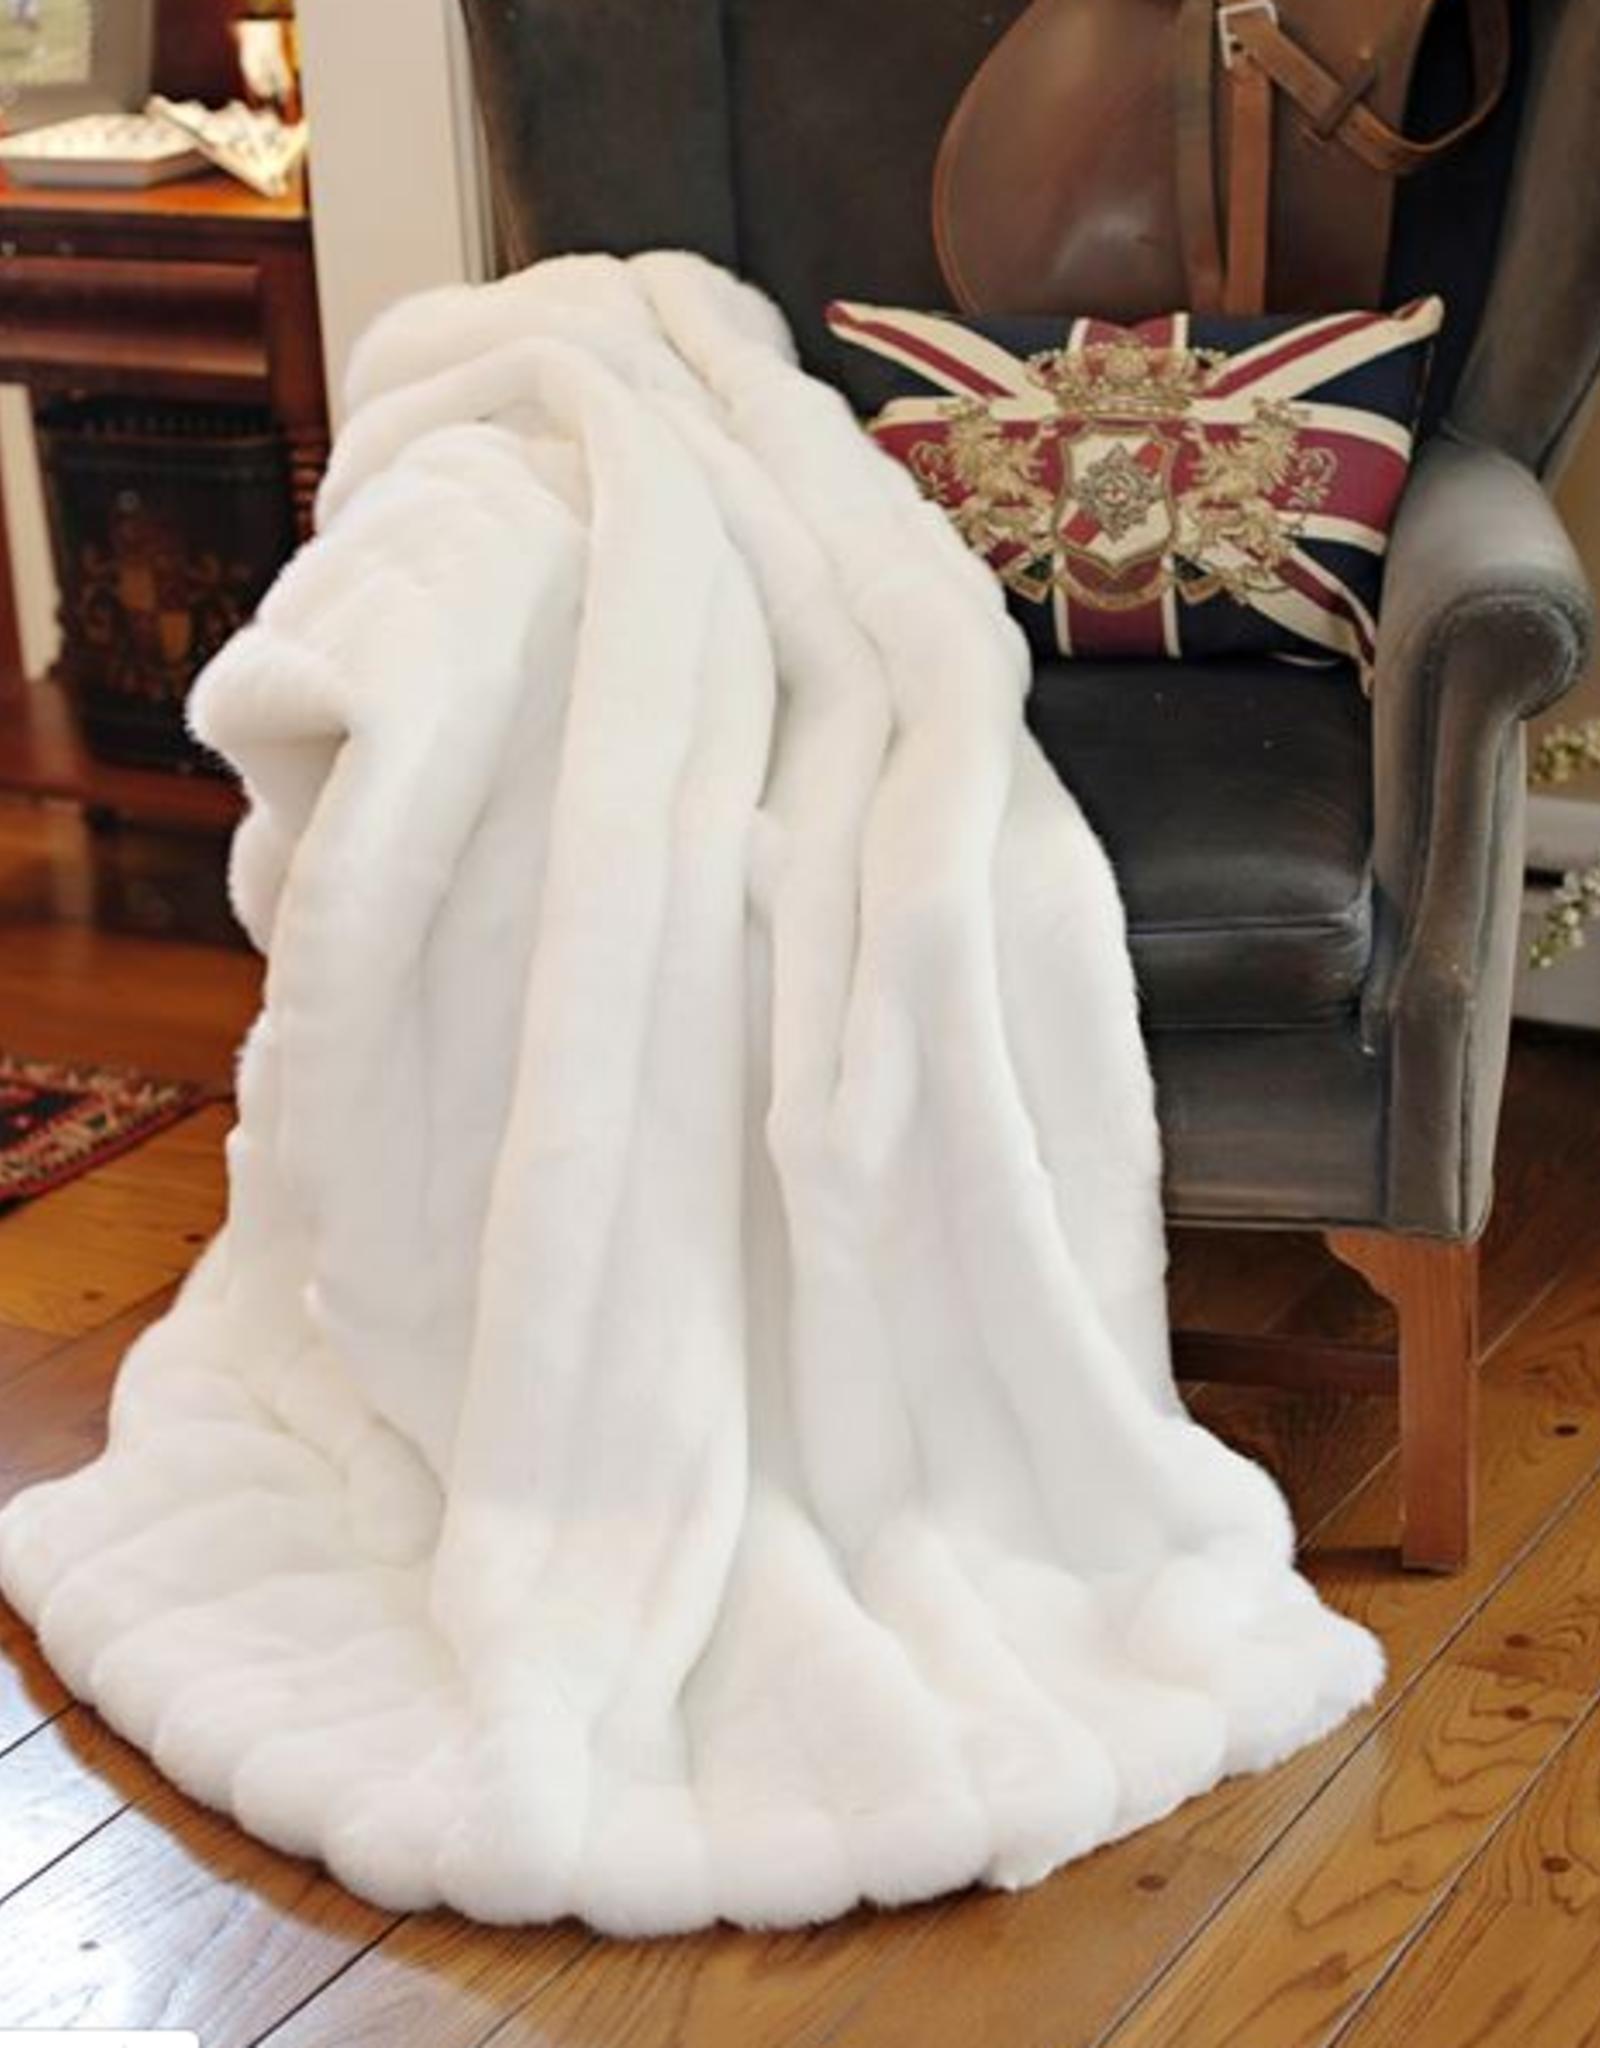 Fabulous Furs Throw White Mink 60x72 Signature Series